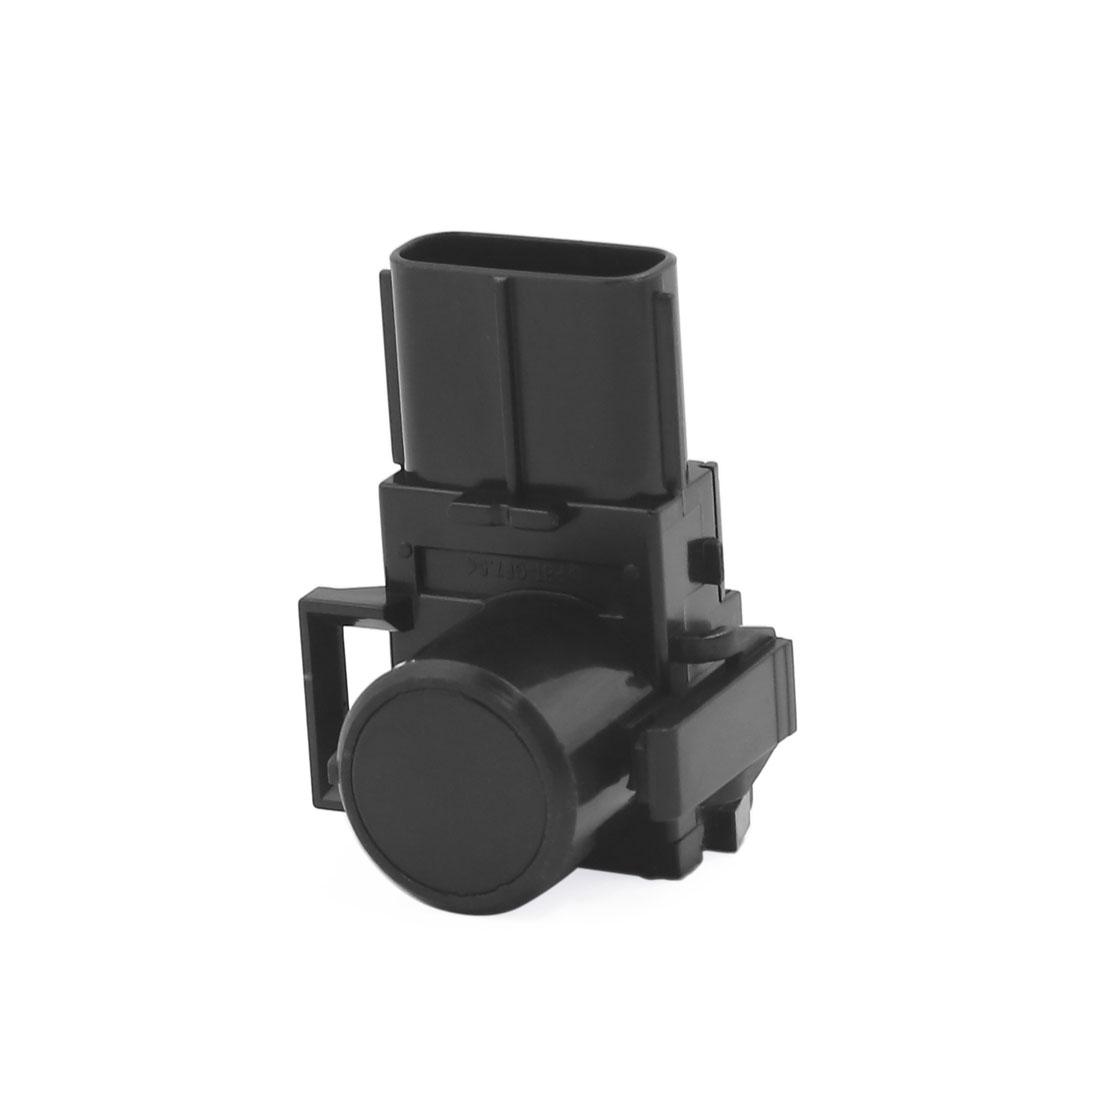 PDC Reverse Parking Sensor for 2007-2013 TOYOTA TUNDRA 89341-06010 188300-0560